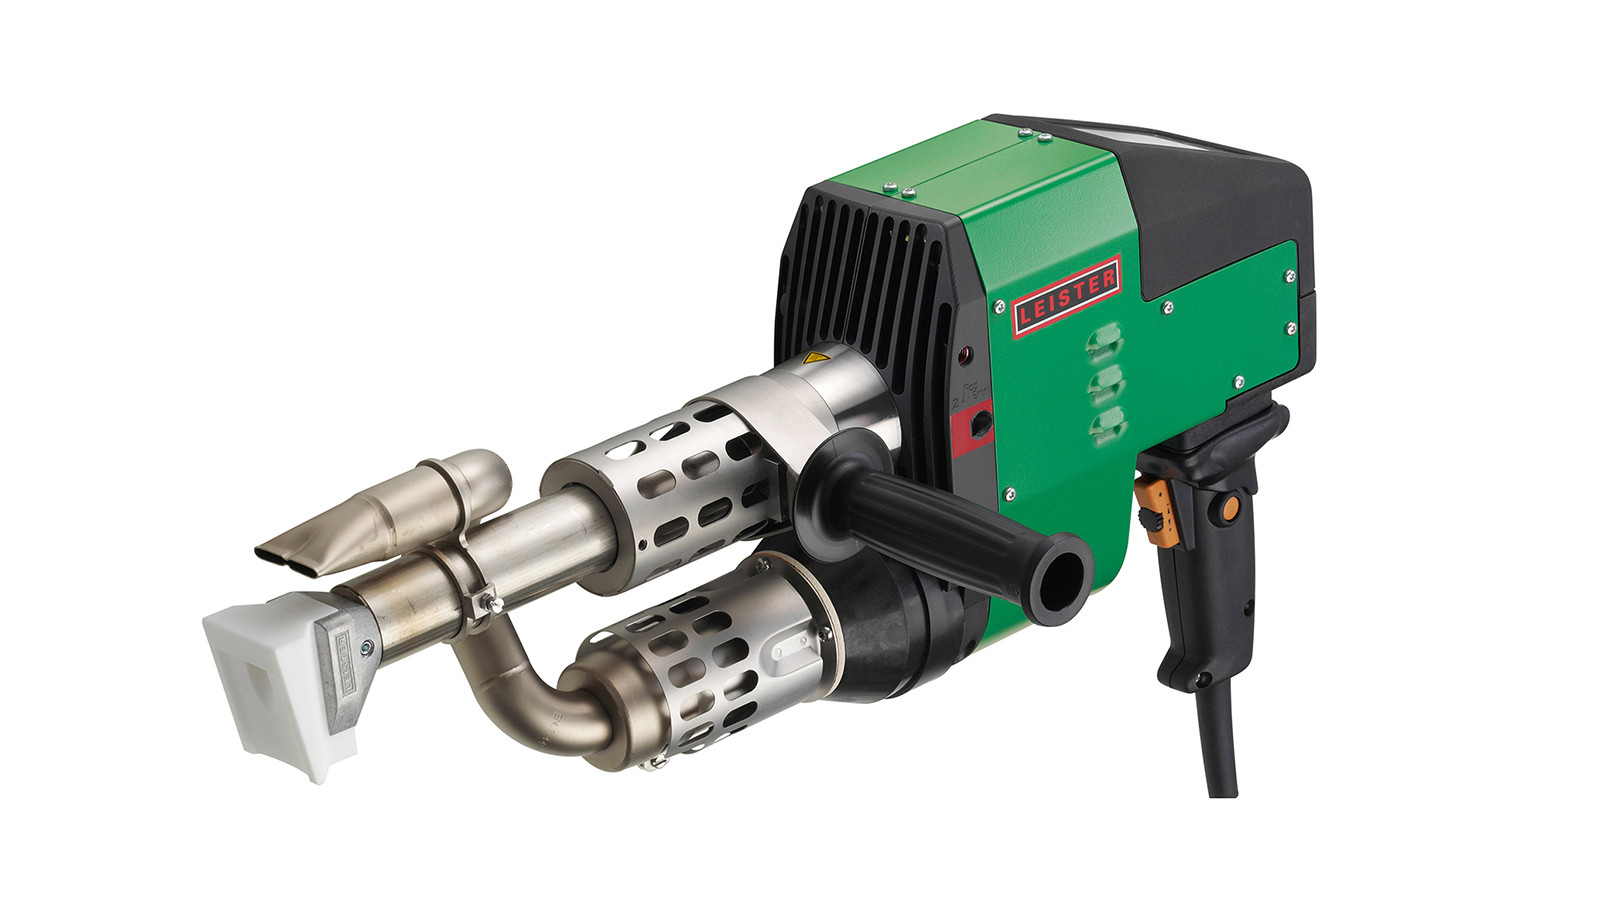 Leister WELDPLAST S4 Hand Extruder 230V - 116.948